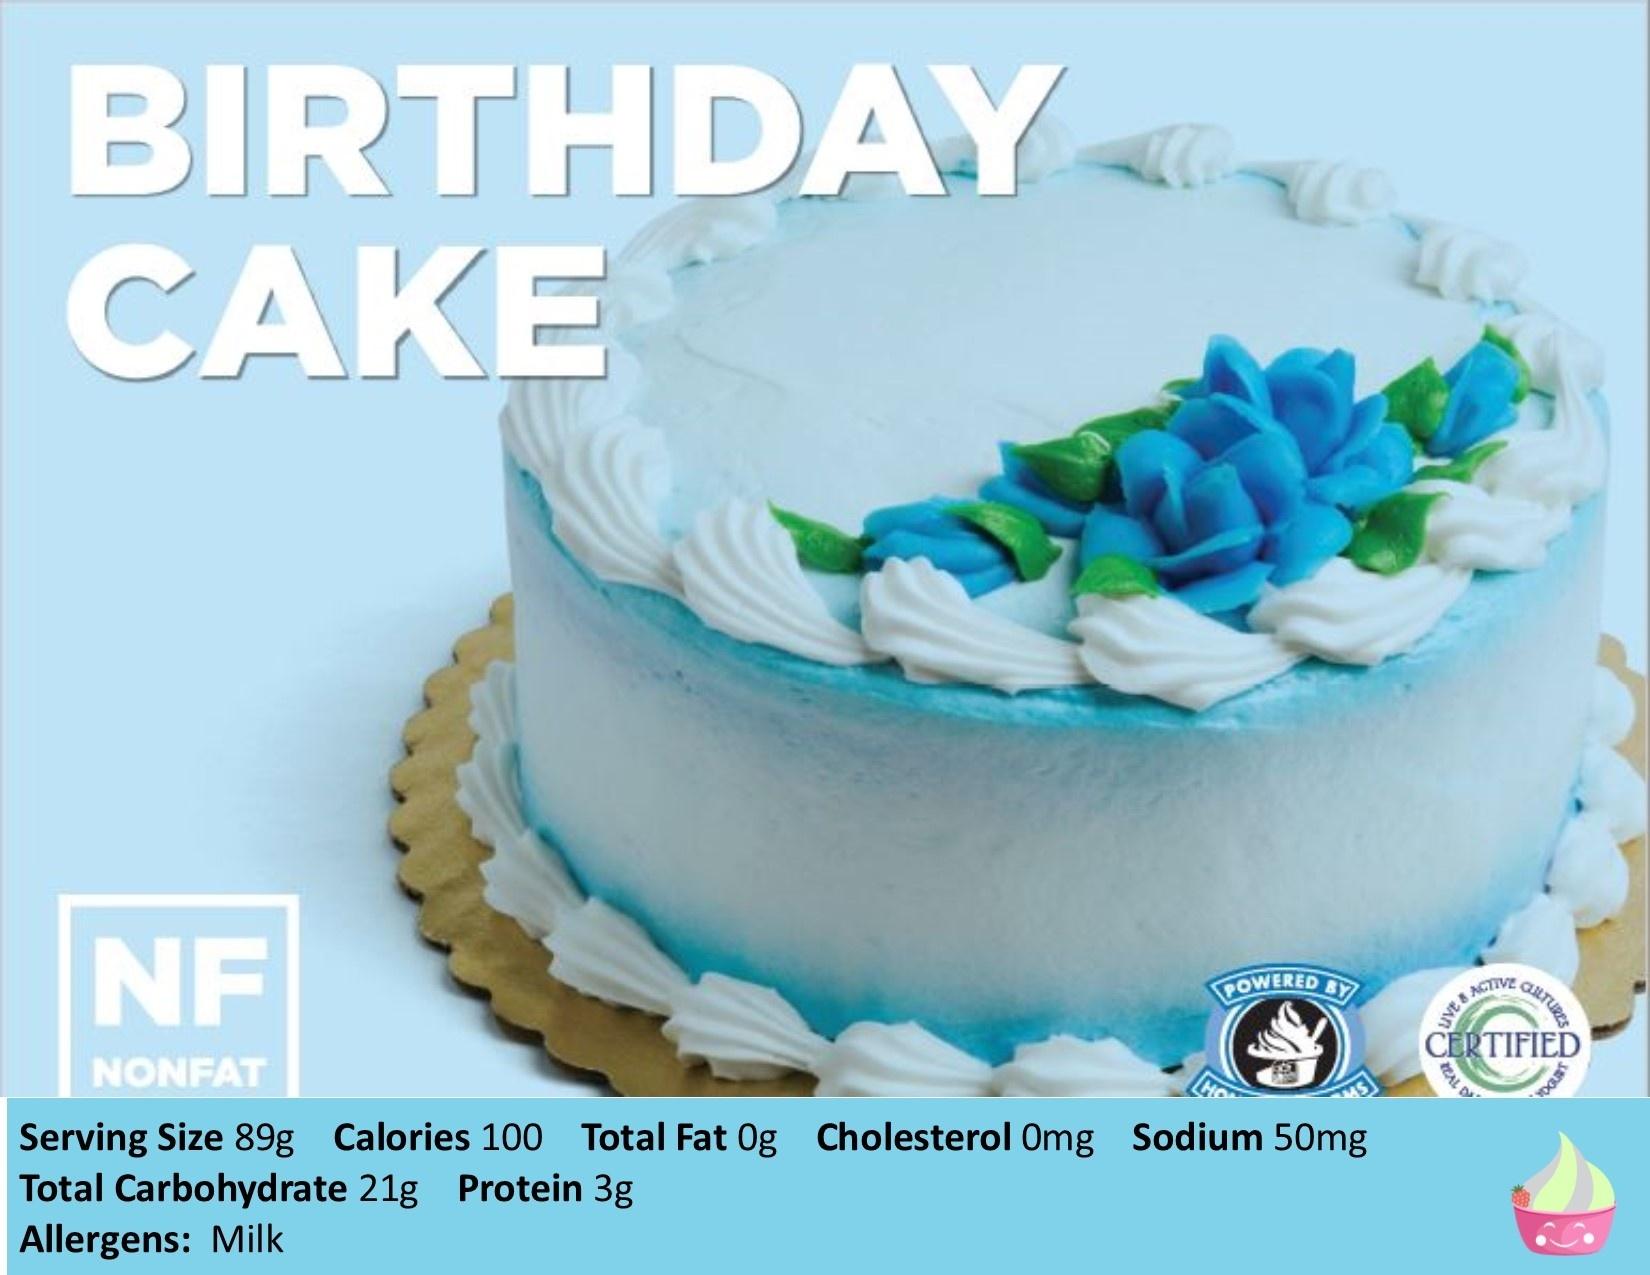 https://0201.nccdn.net/4_2/000/000/00d/f43/Birthday-Cake-NF-1650x1275-1650x1275.jpg